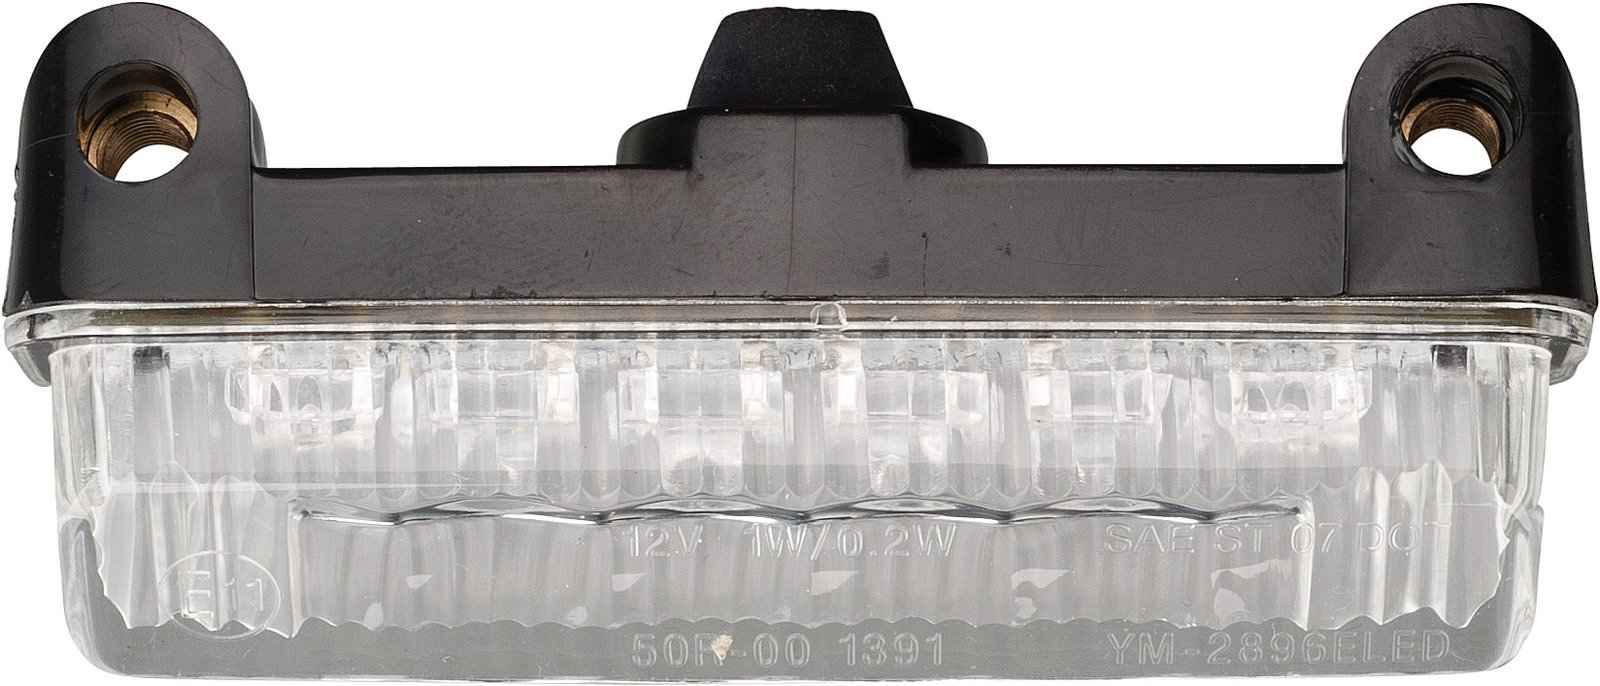 Yamaha SR500 and Triumph Modern Classics (Scrambler Thruxton and Bonneville) Micro Clear Lens LED JvB-moto Tail Light